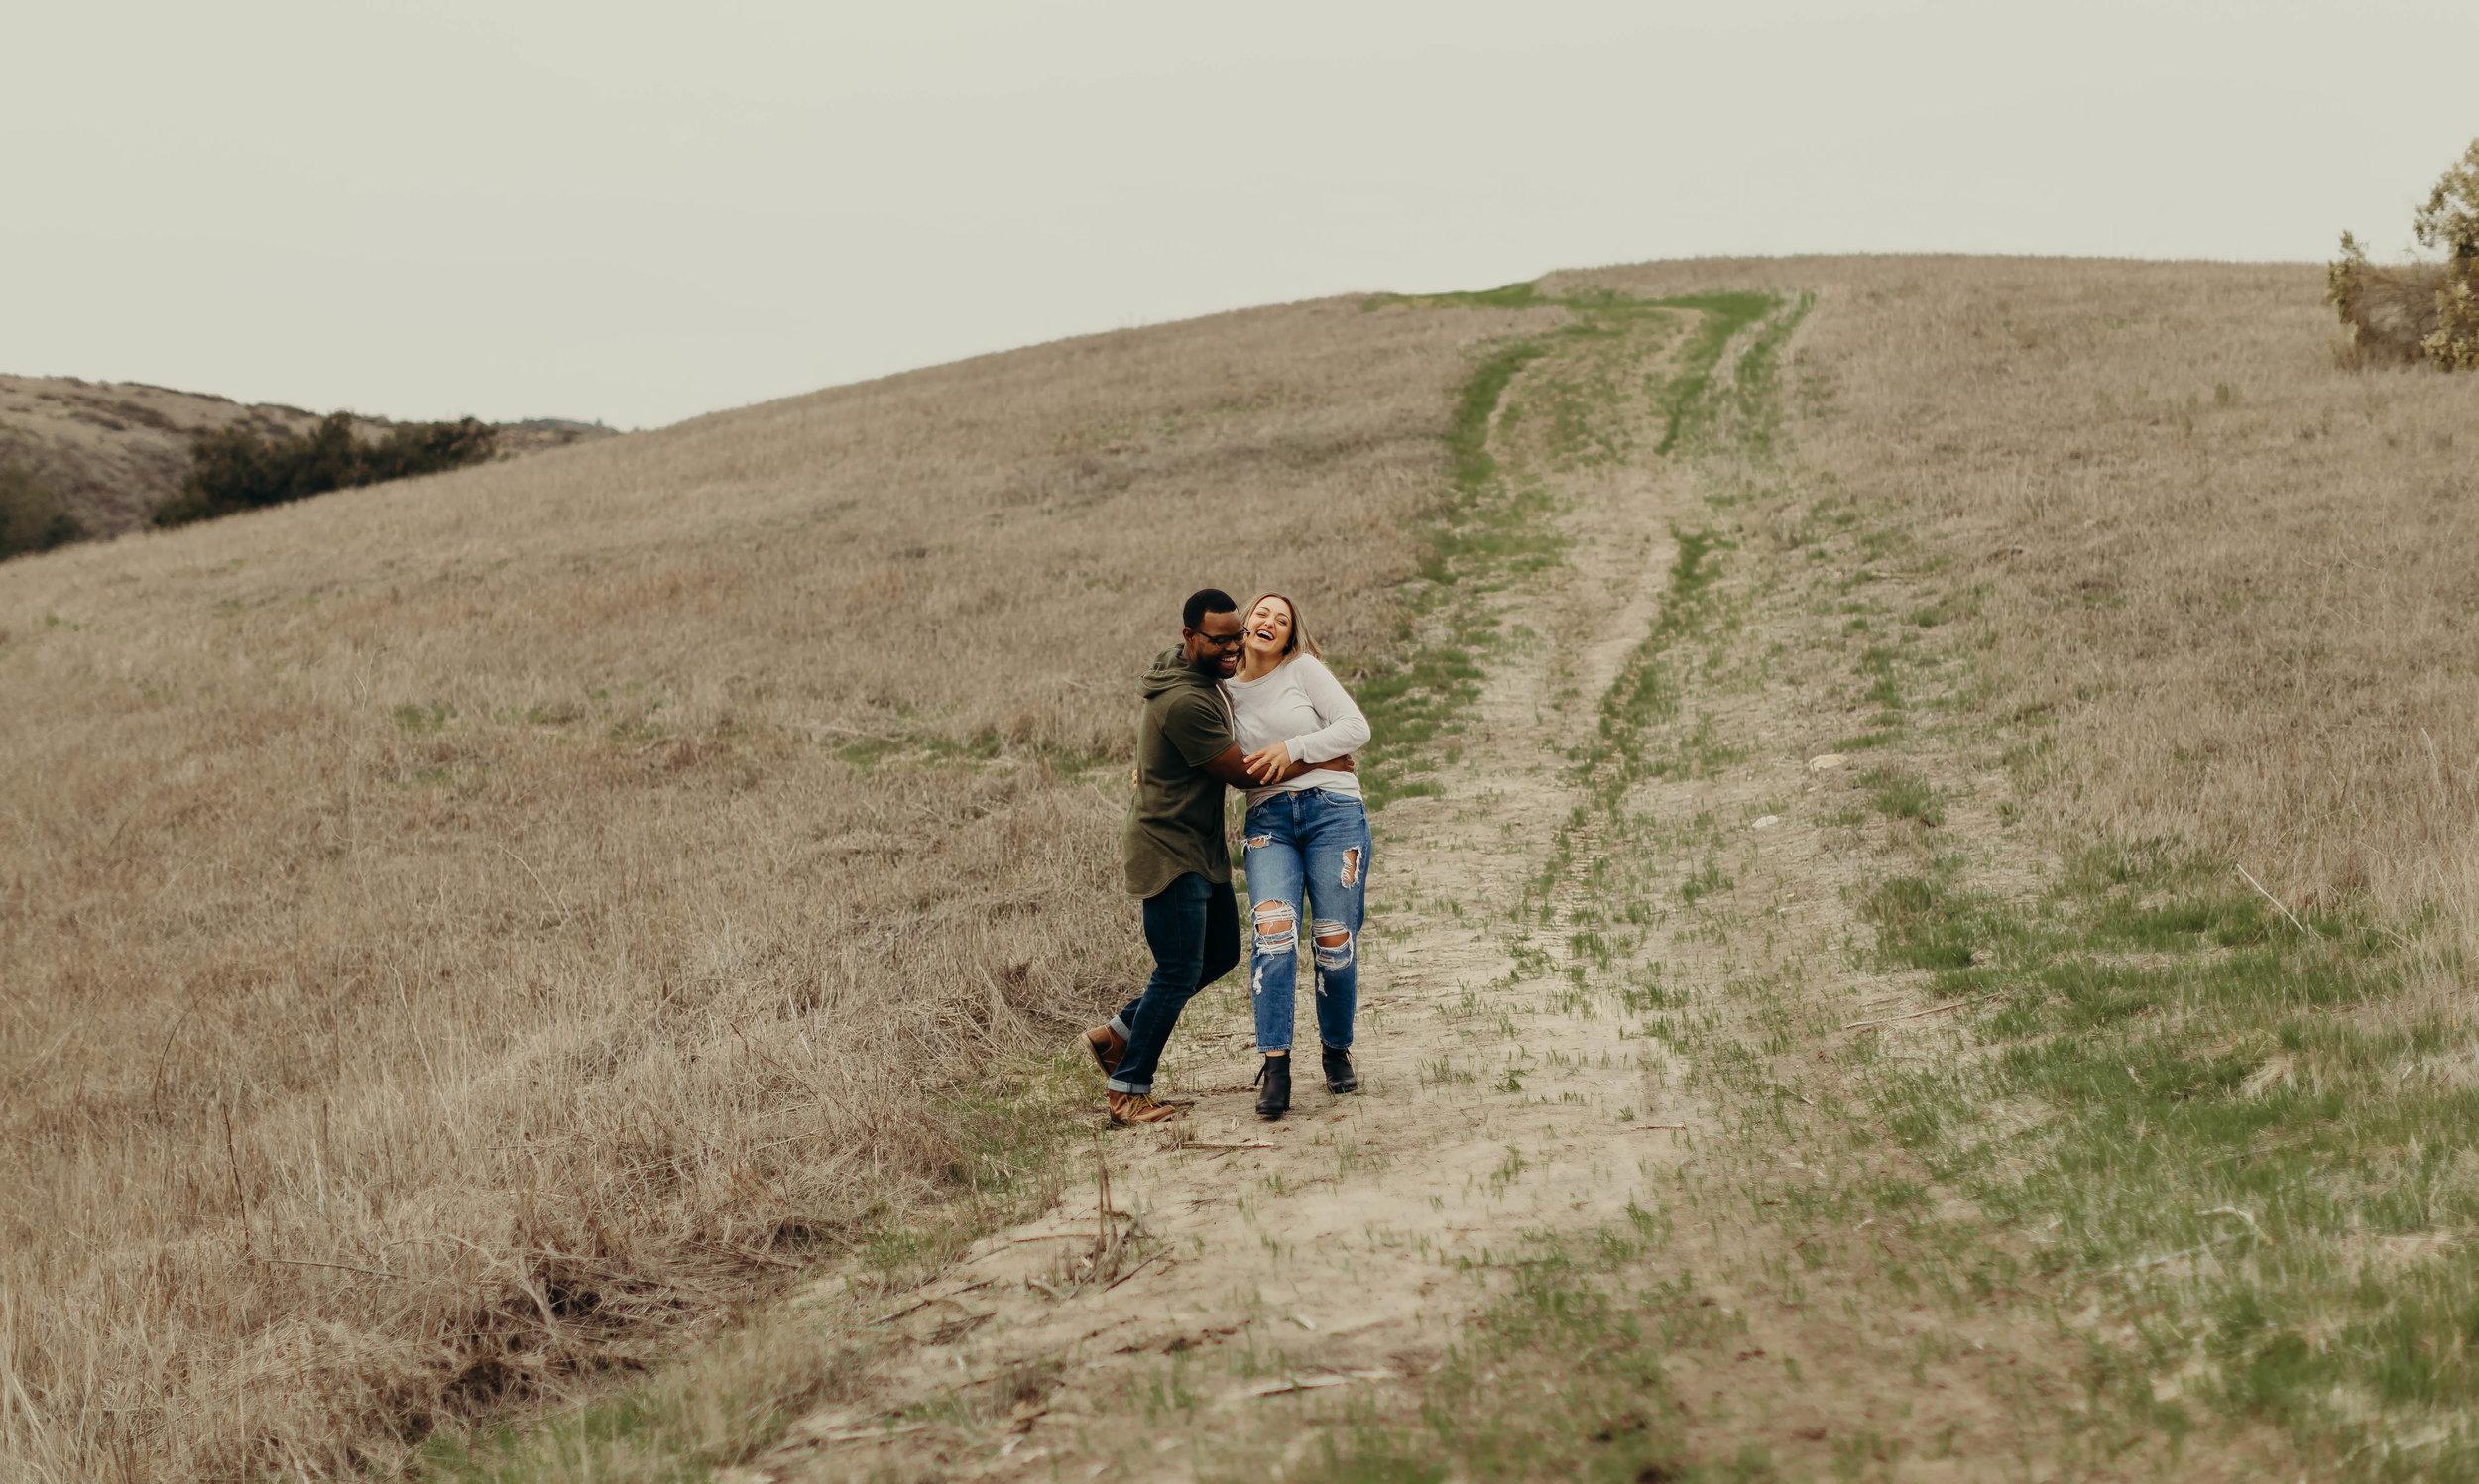 Megan and Joshua_Couples Session_2018_Previews-5.jpg